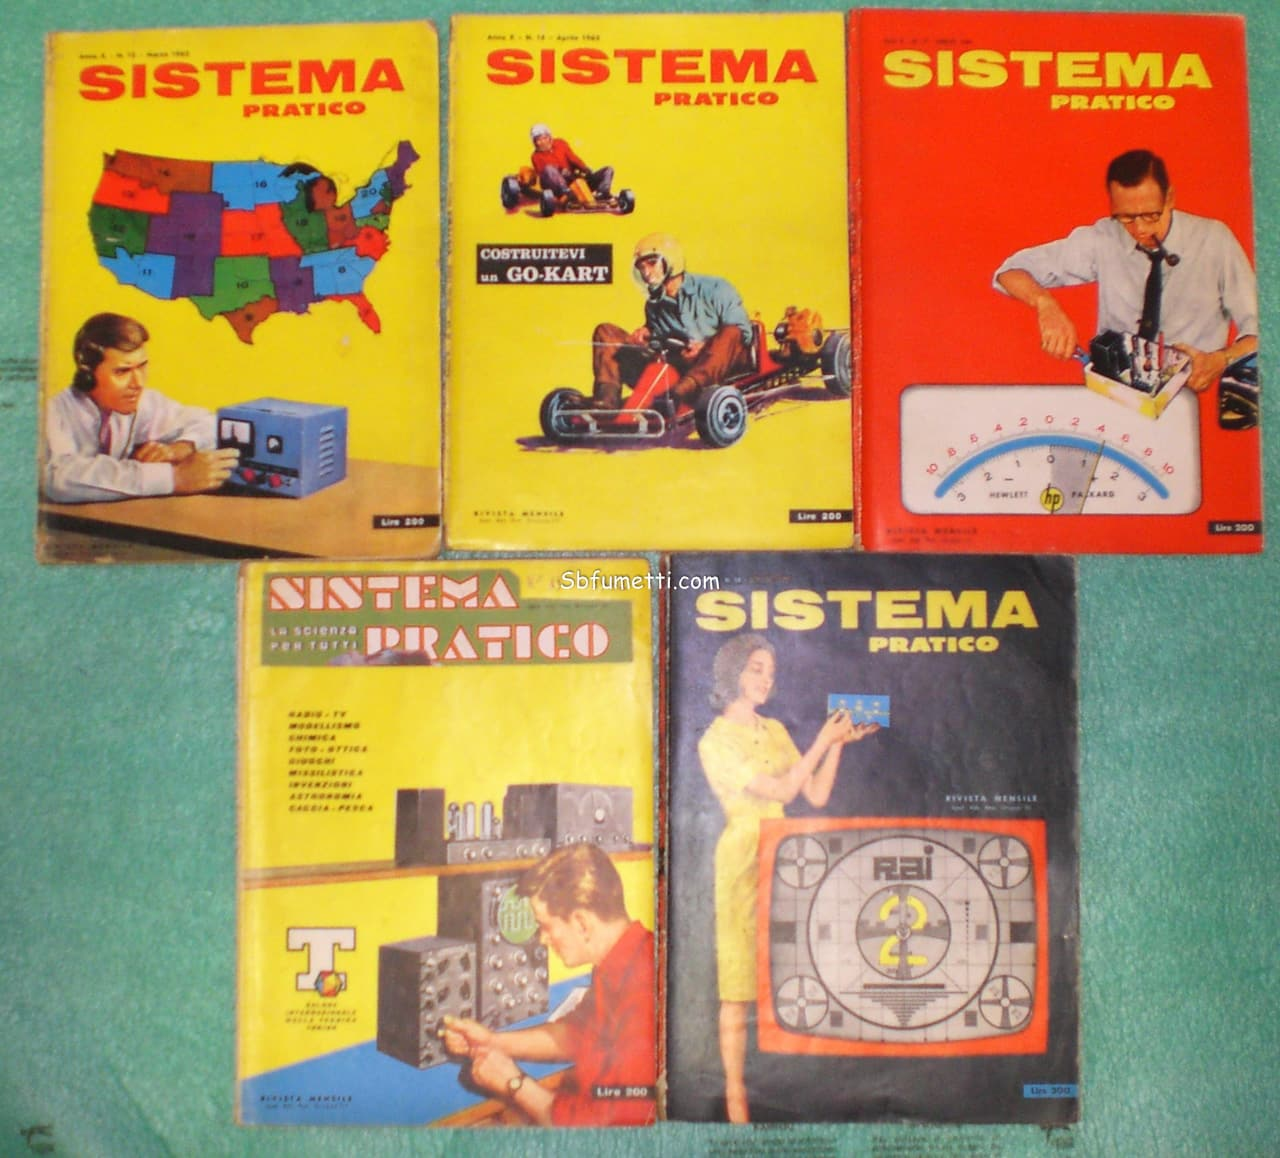 Sistema Pratico anno 10° n. 14 – 18